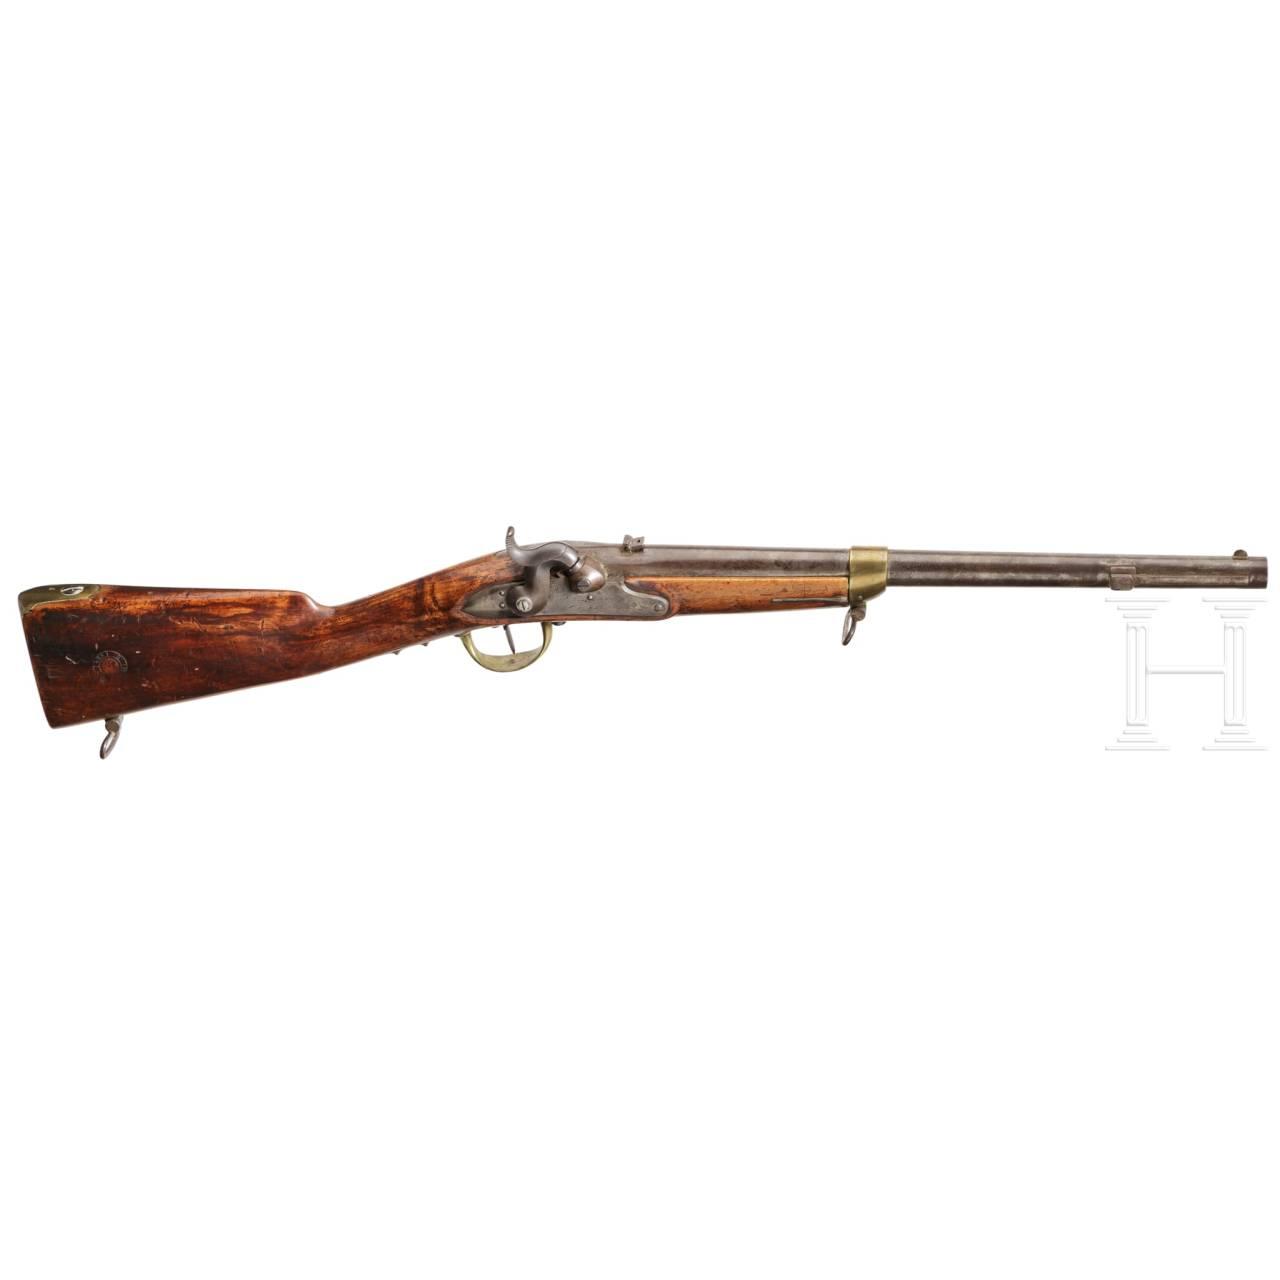 A very rare Baden rifled engineer's carbine M 1850/54 U/M